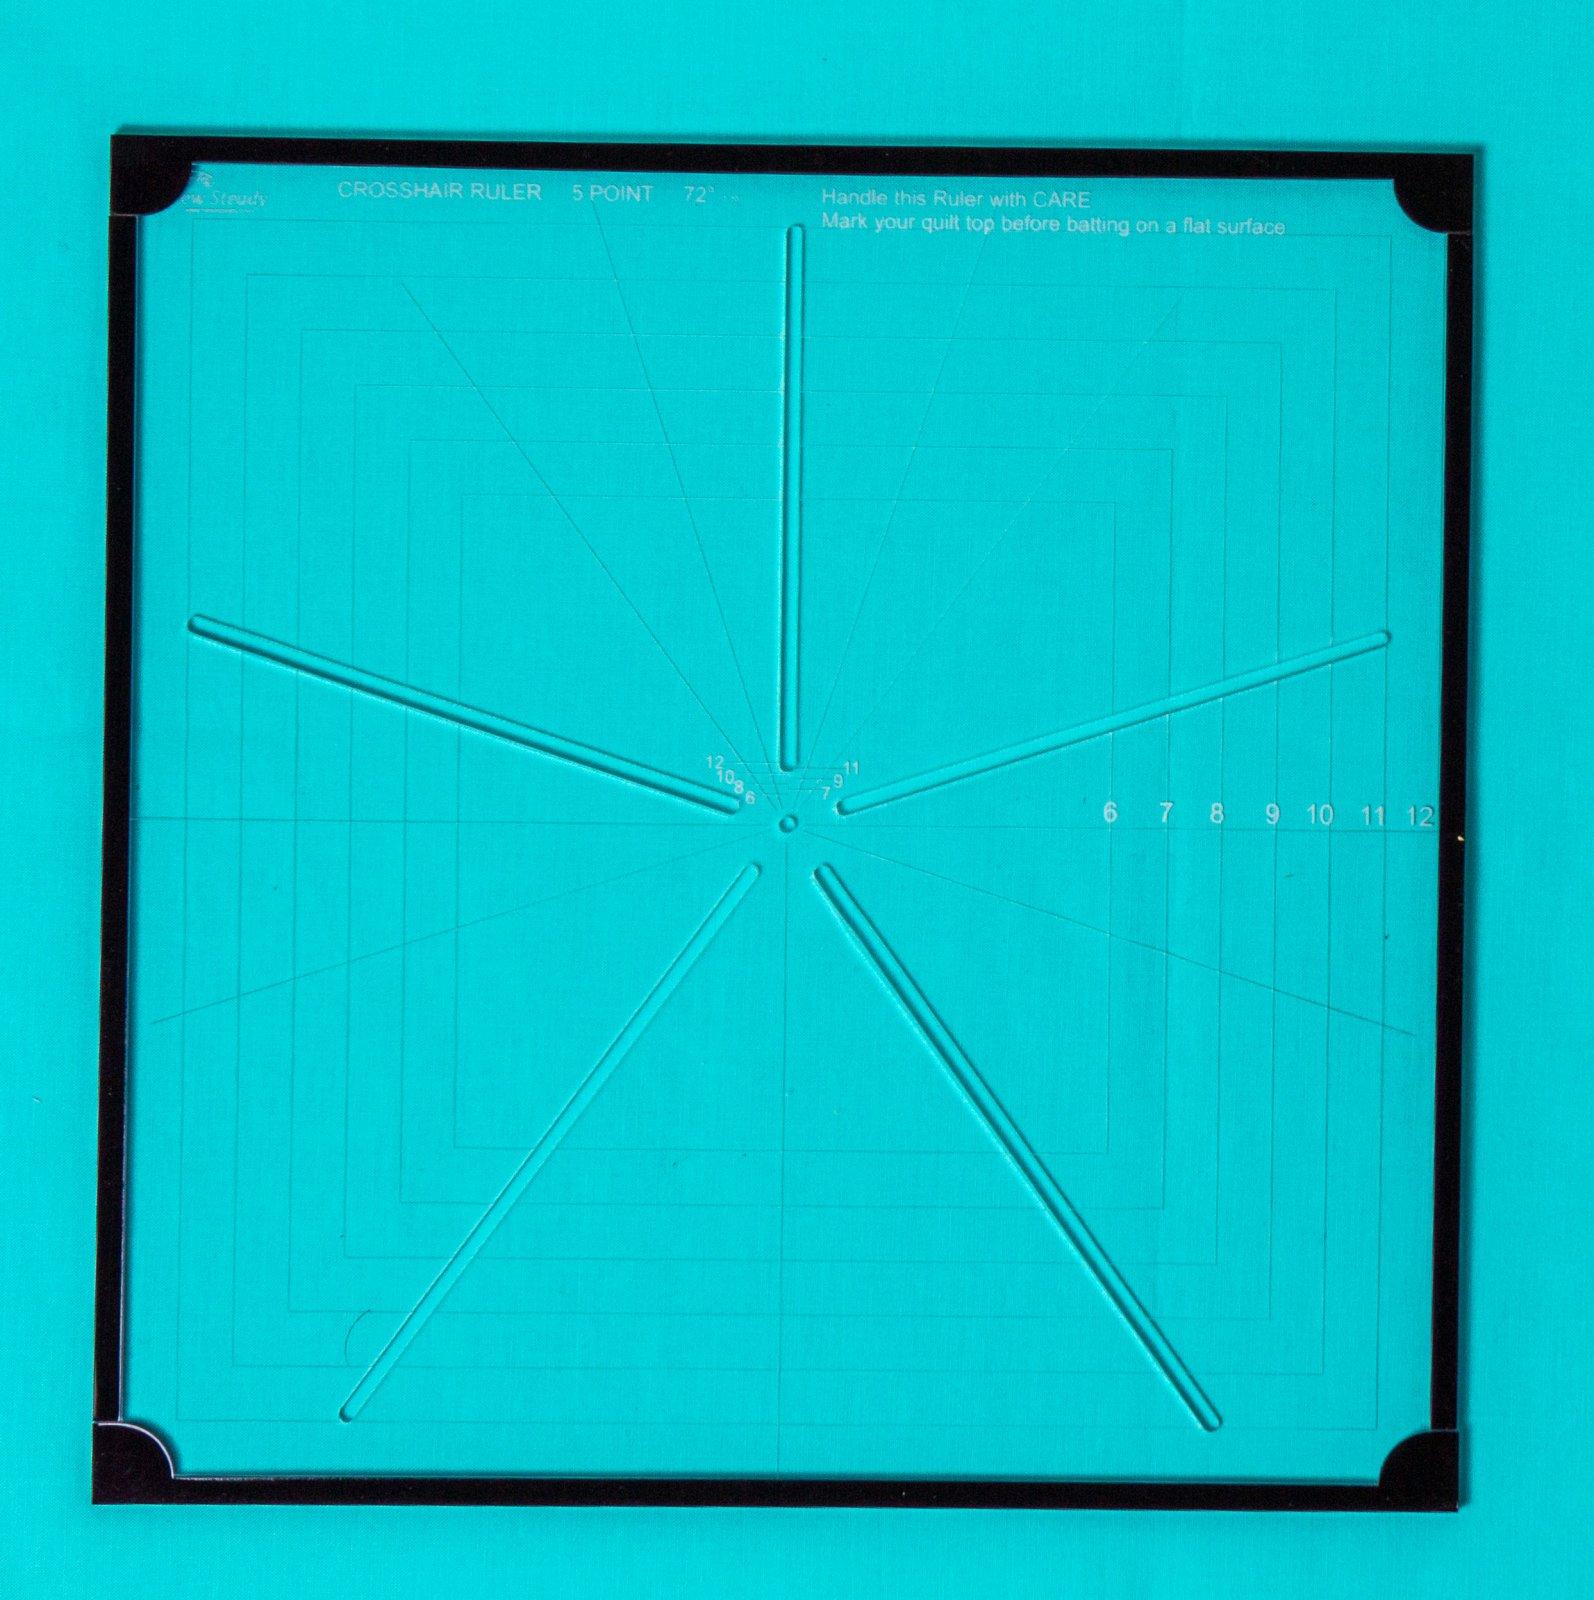 Westalee Crosshair Square CHS5PT-8.5 Template